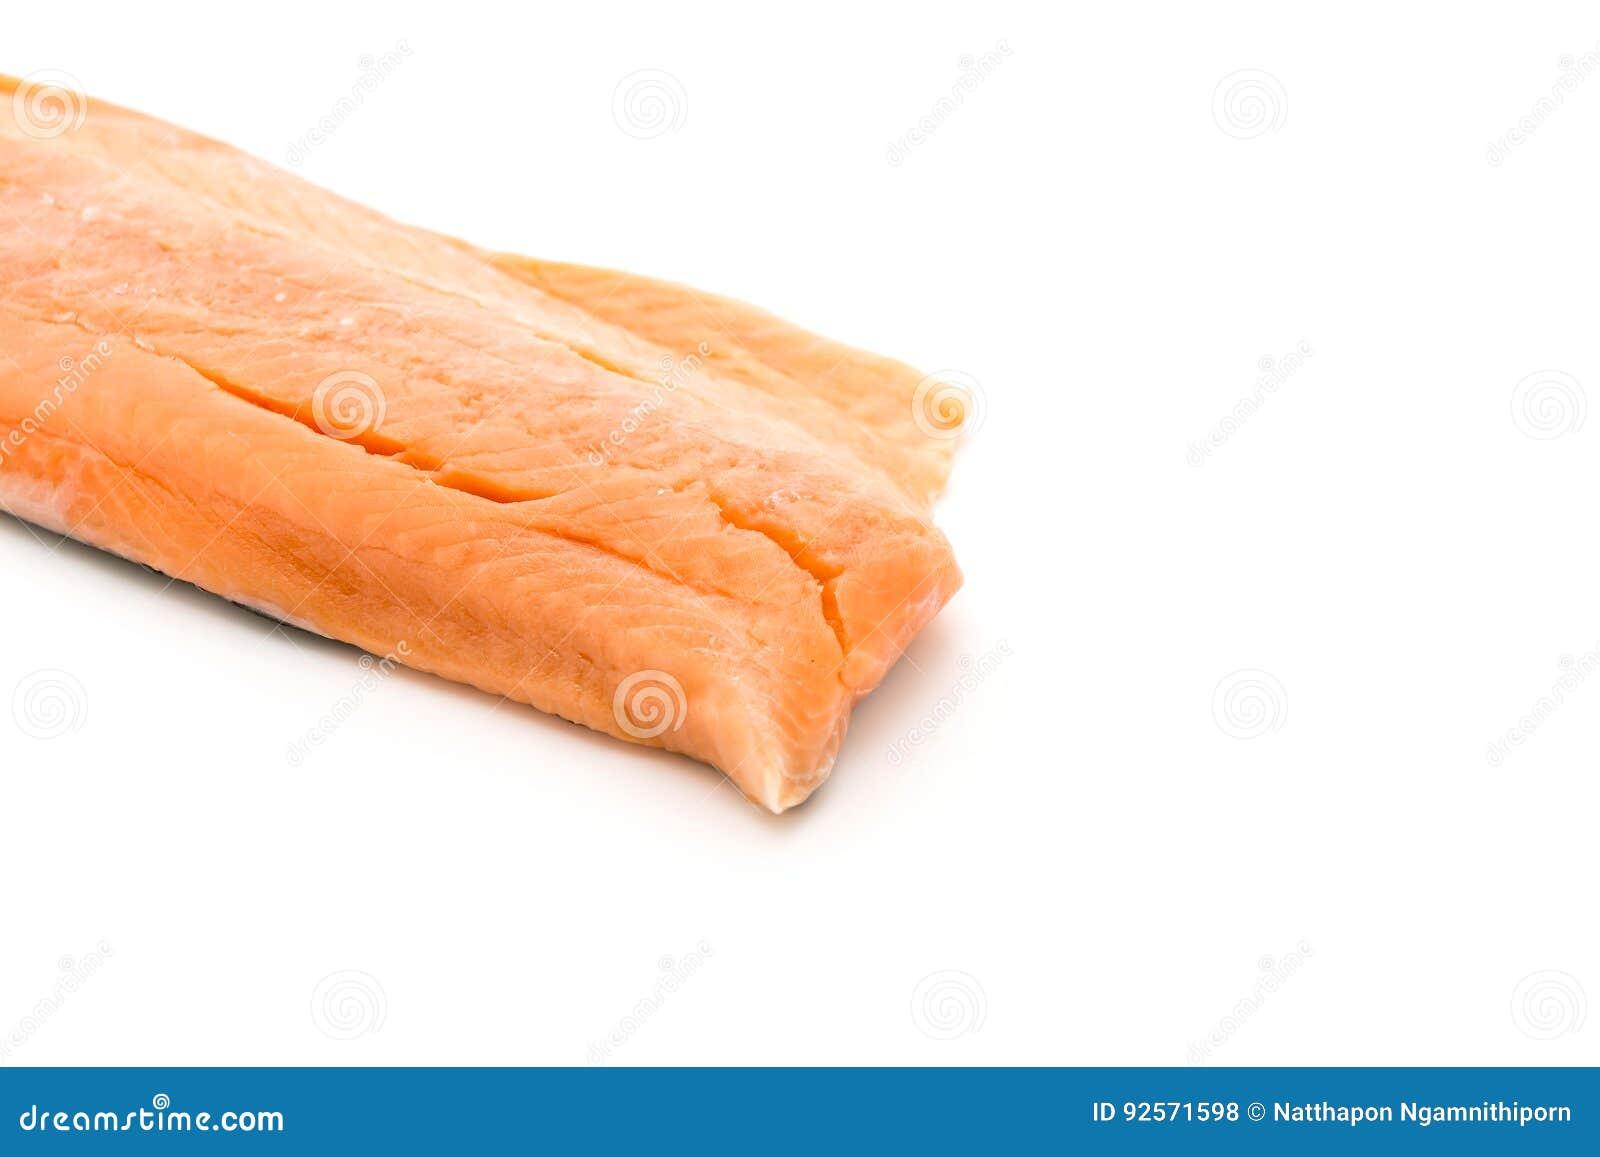 Salmone fresco su bianco